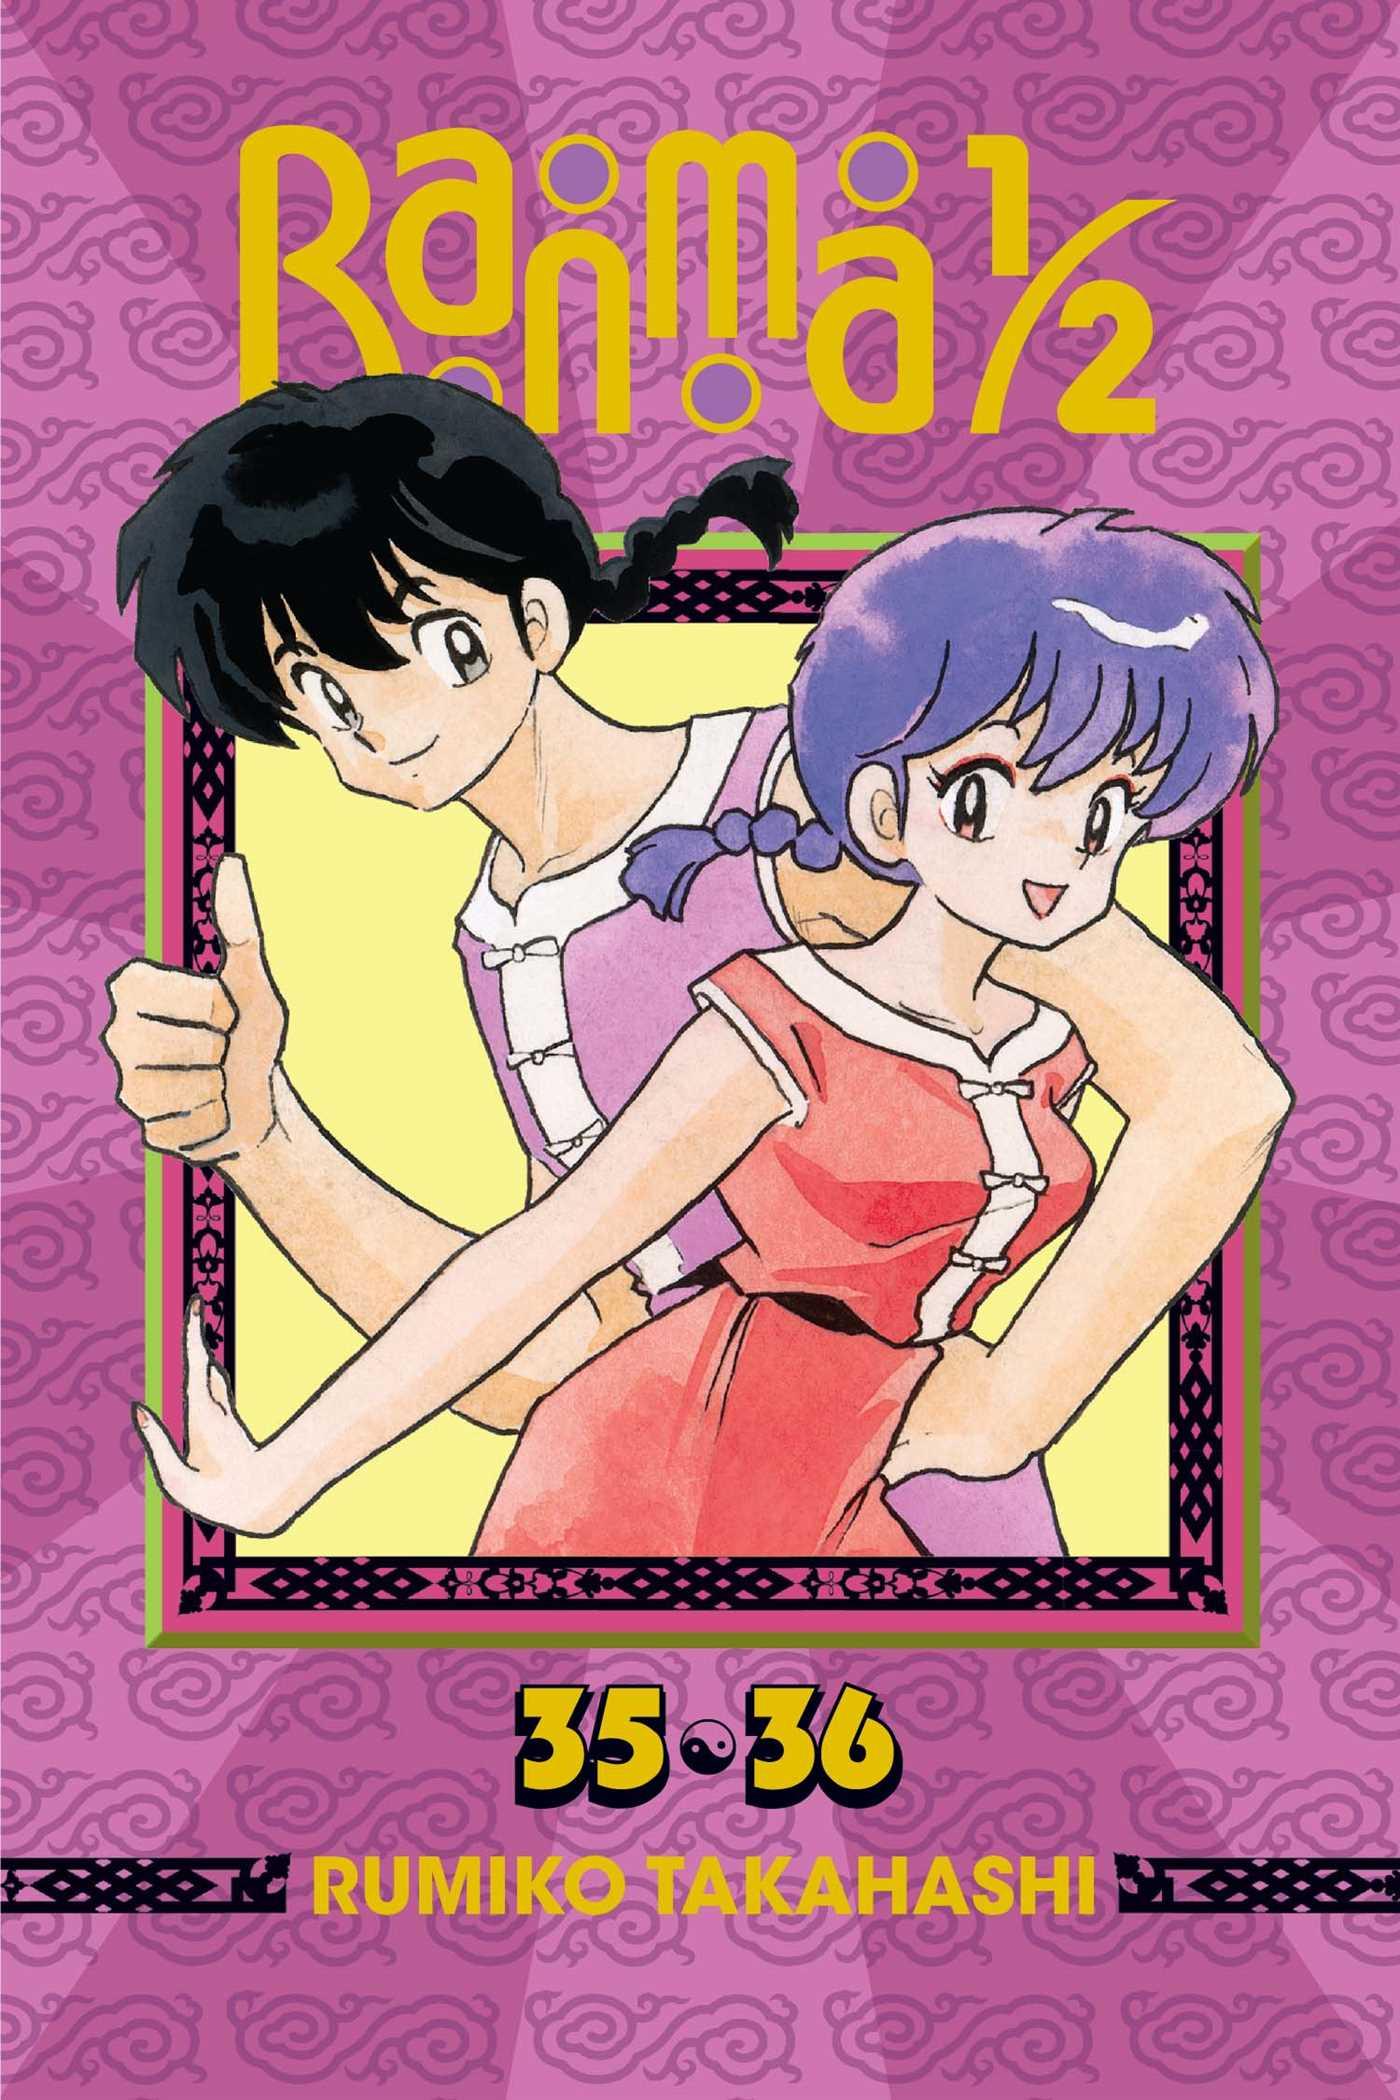 Ranma 1/2 2 In 1 Edition Manga Volume 18